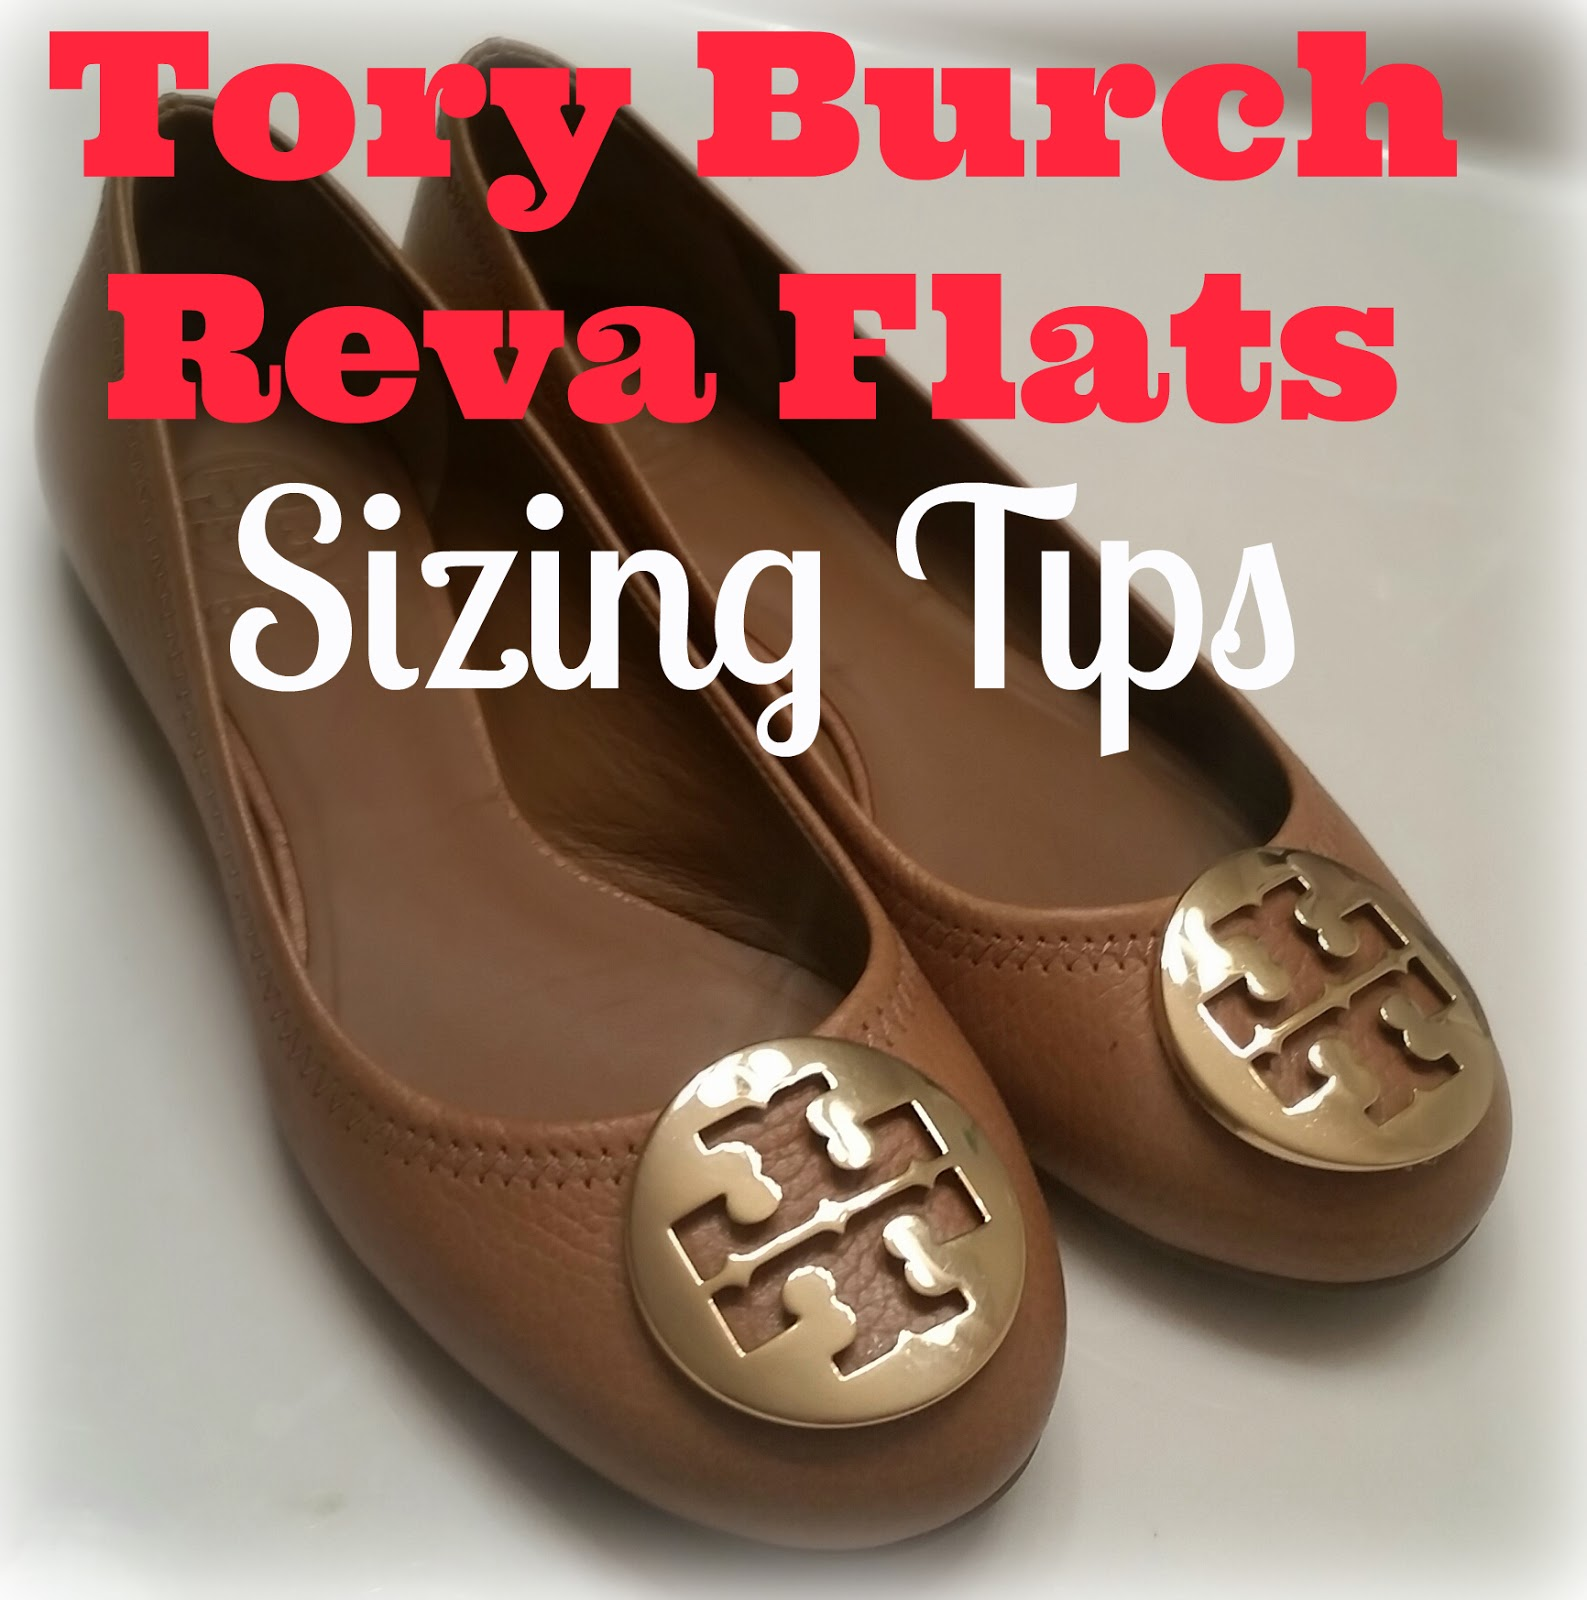 Tory Burch Reva Flats Sizing Tips